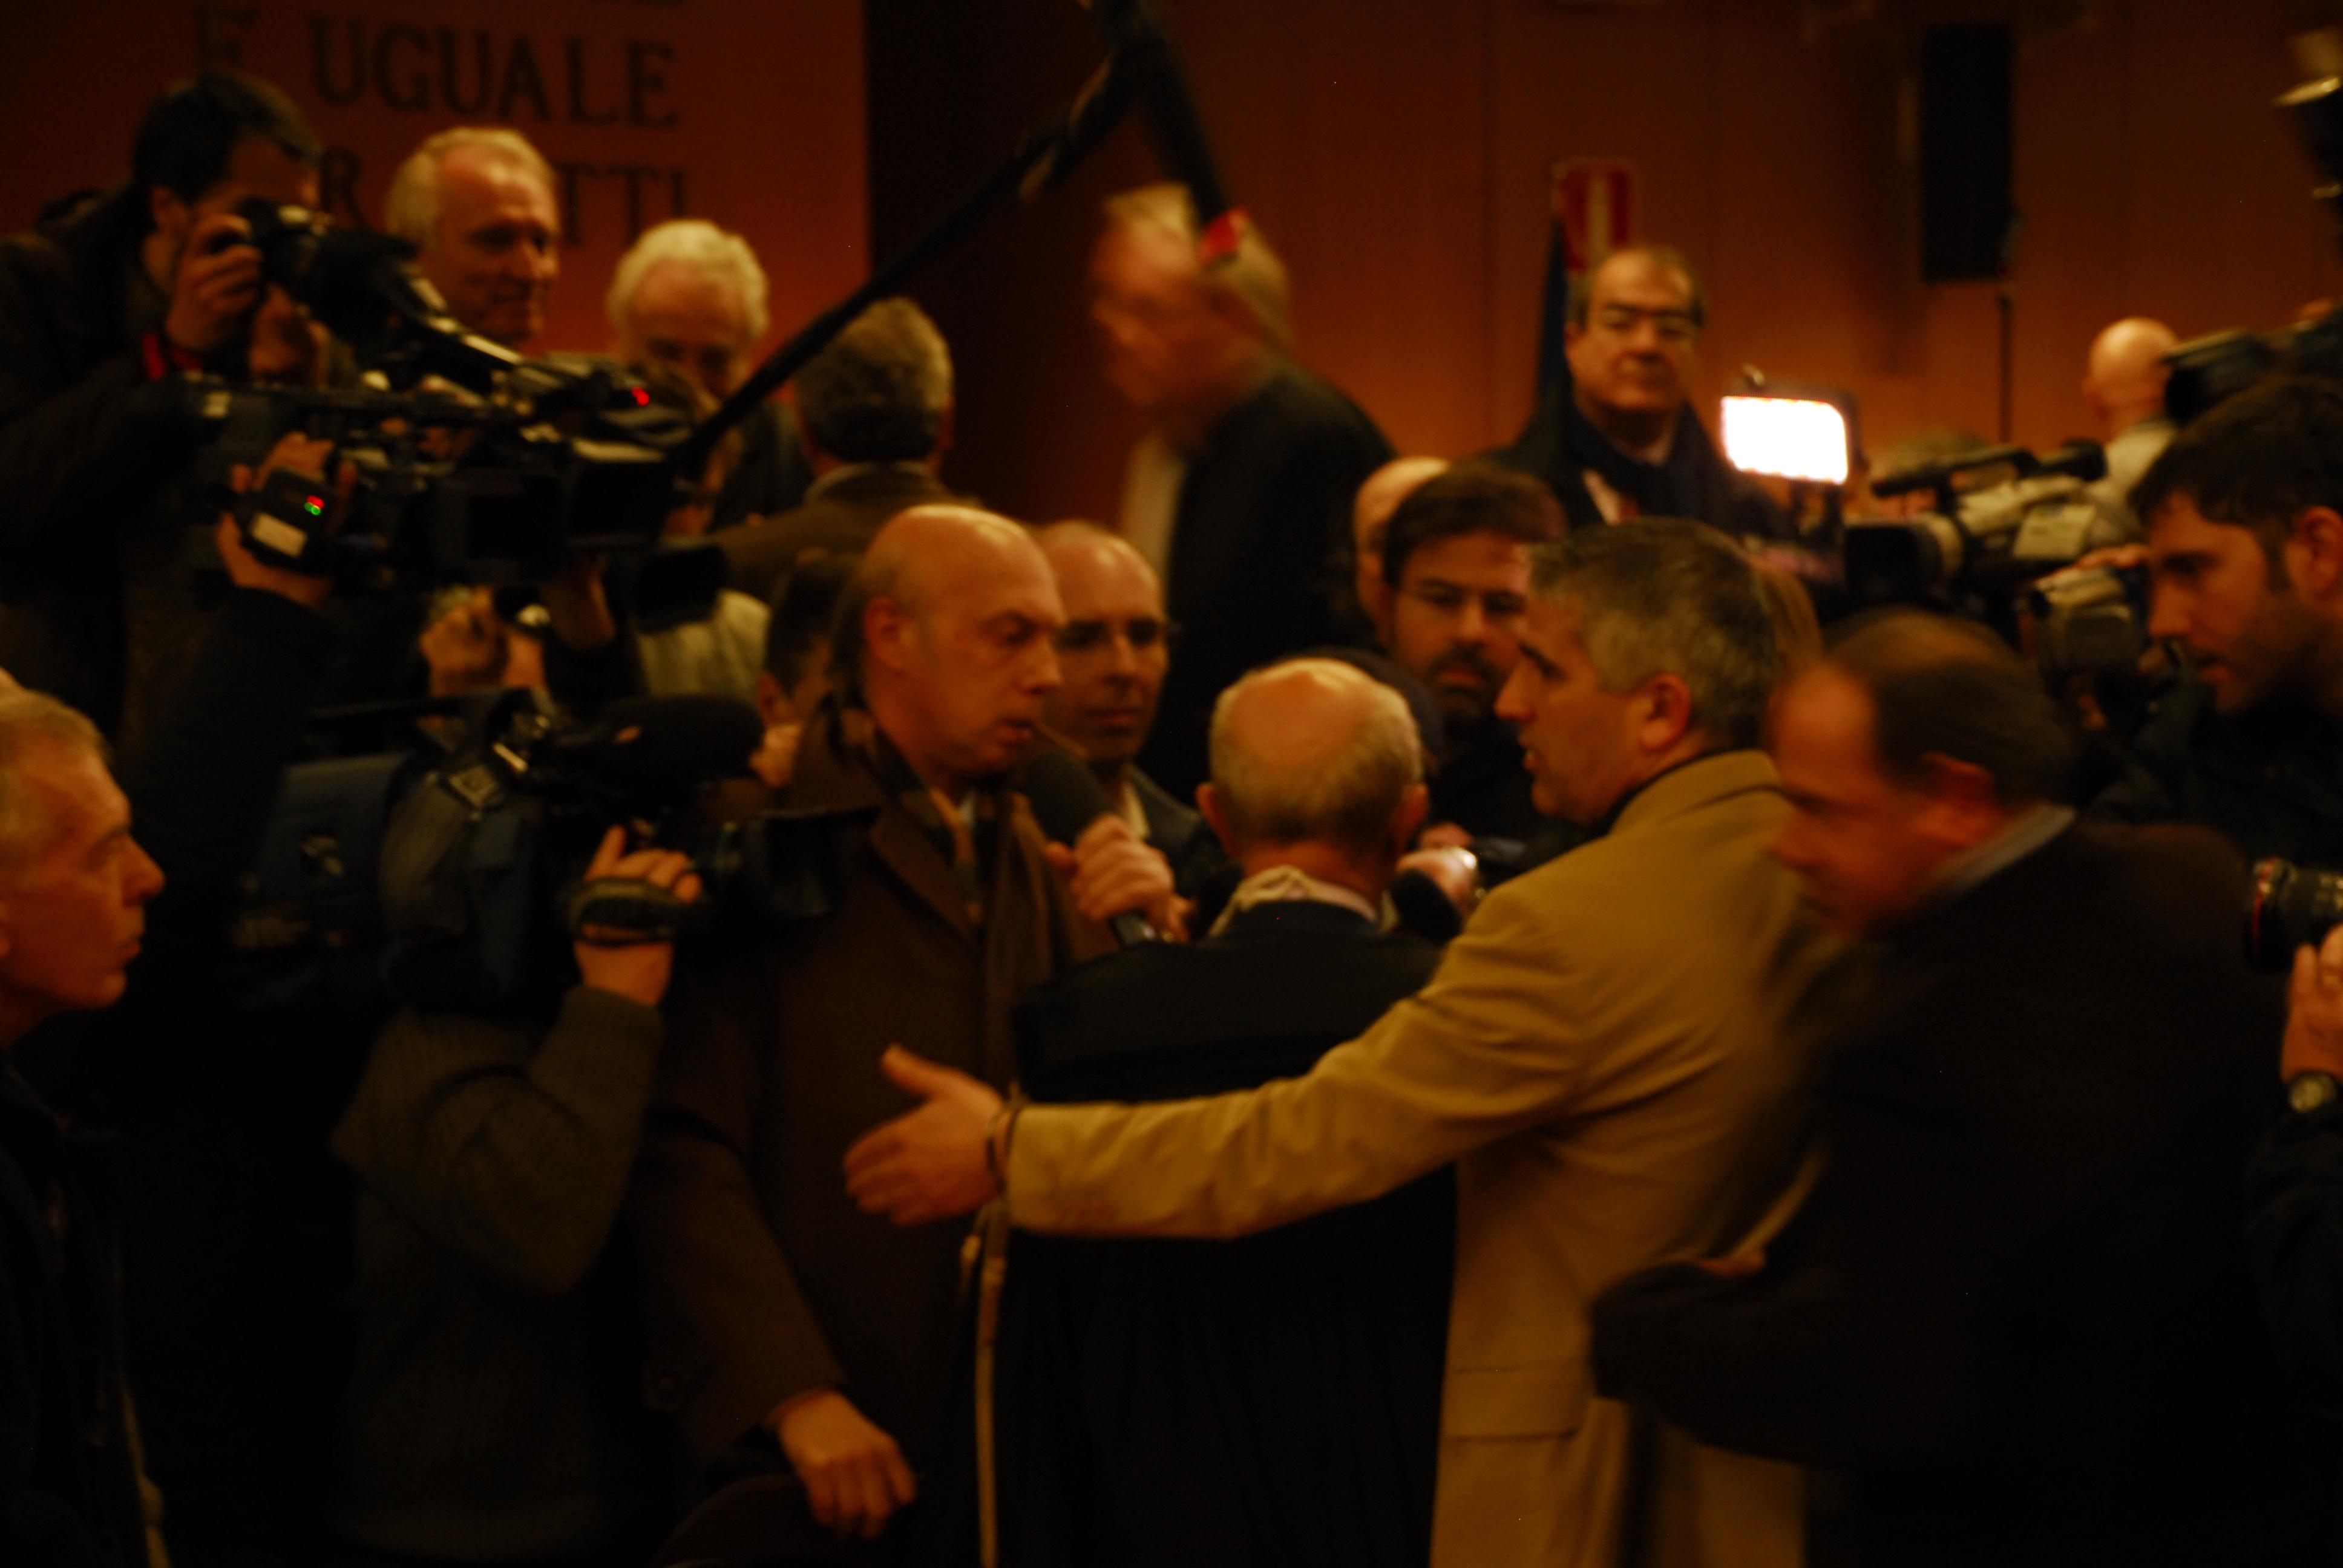 Le procureur Raffaelle Guariniello (au centre, de dos)